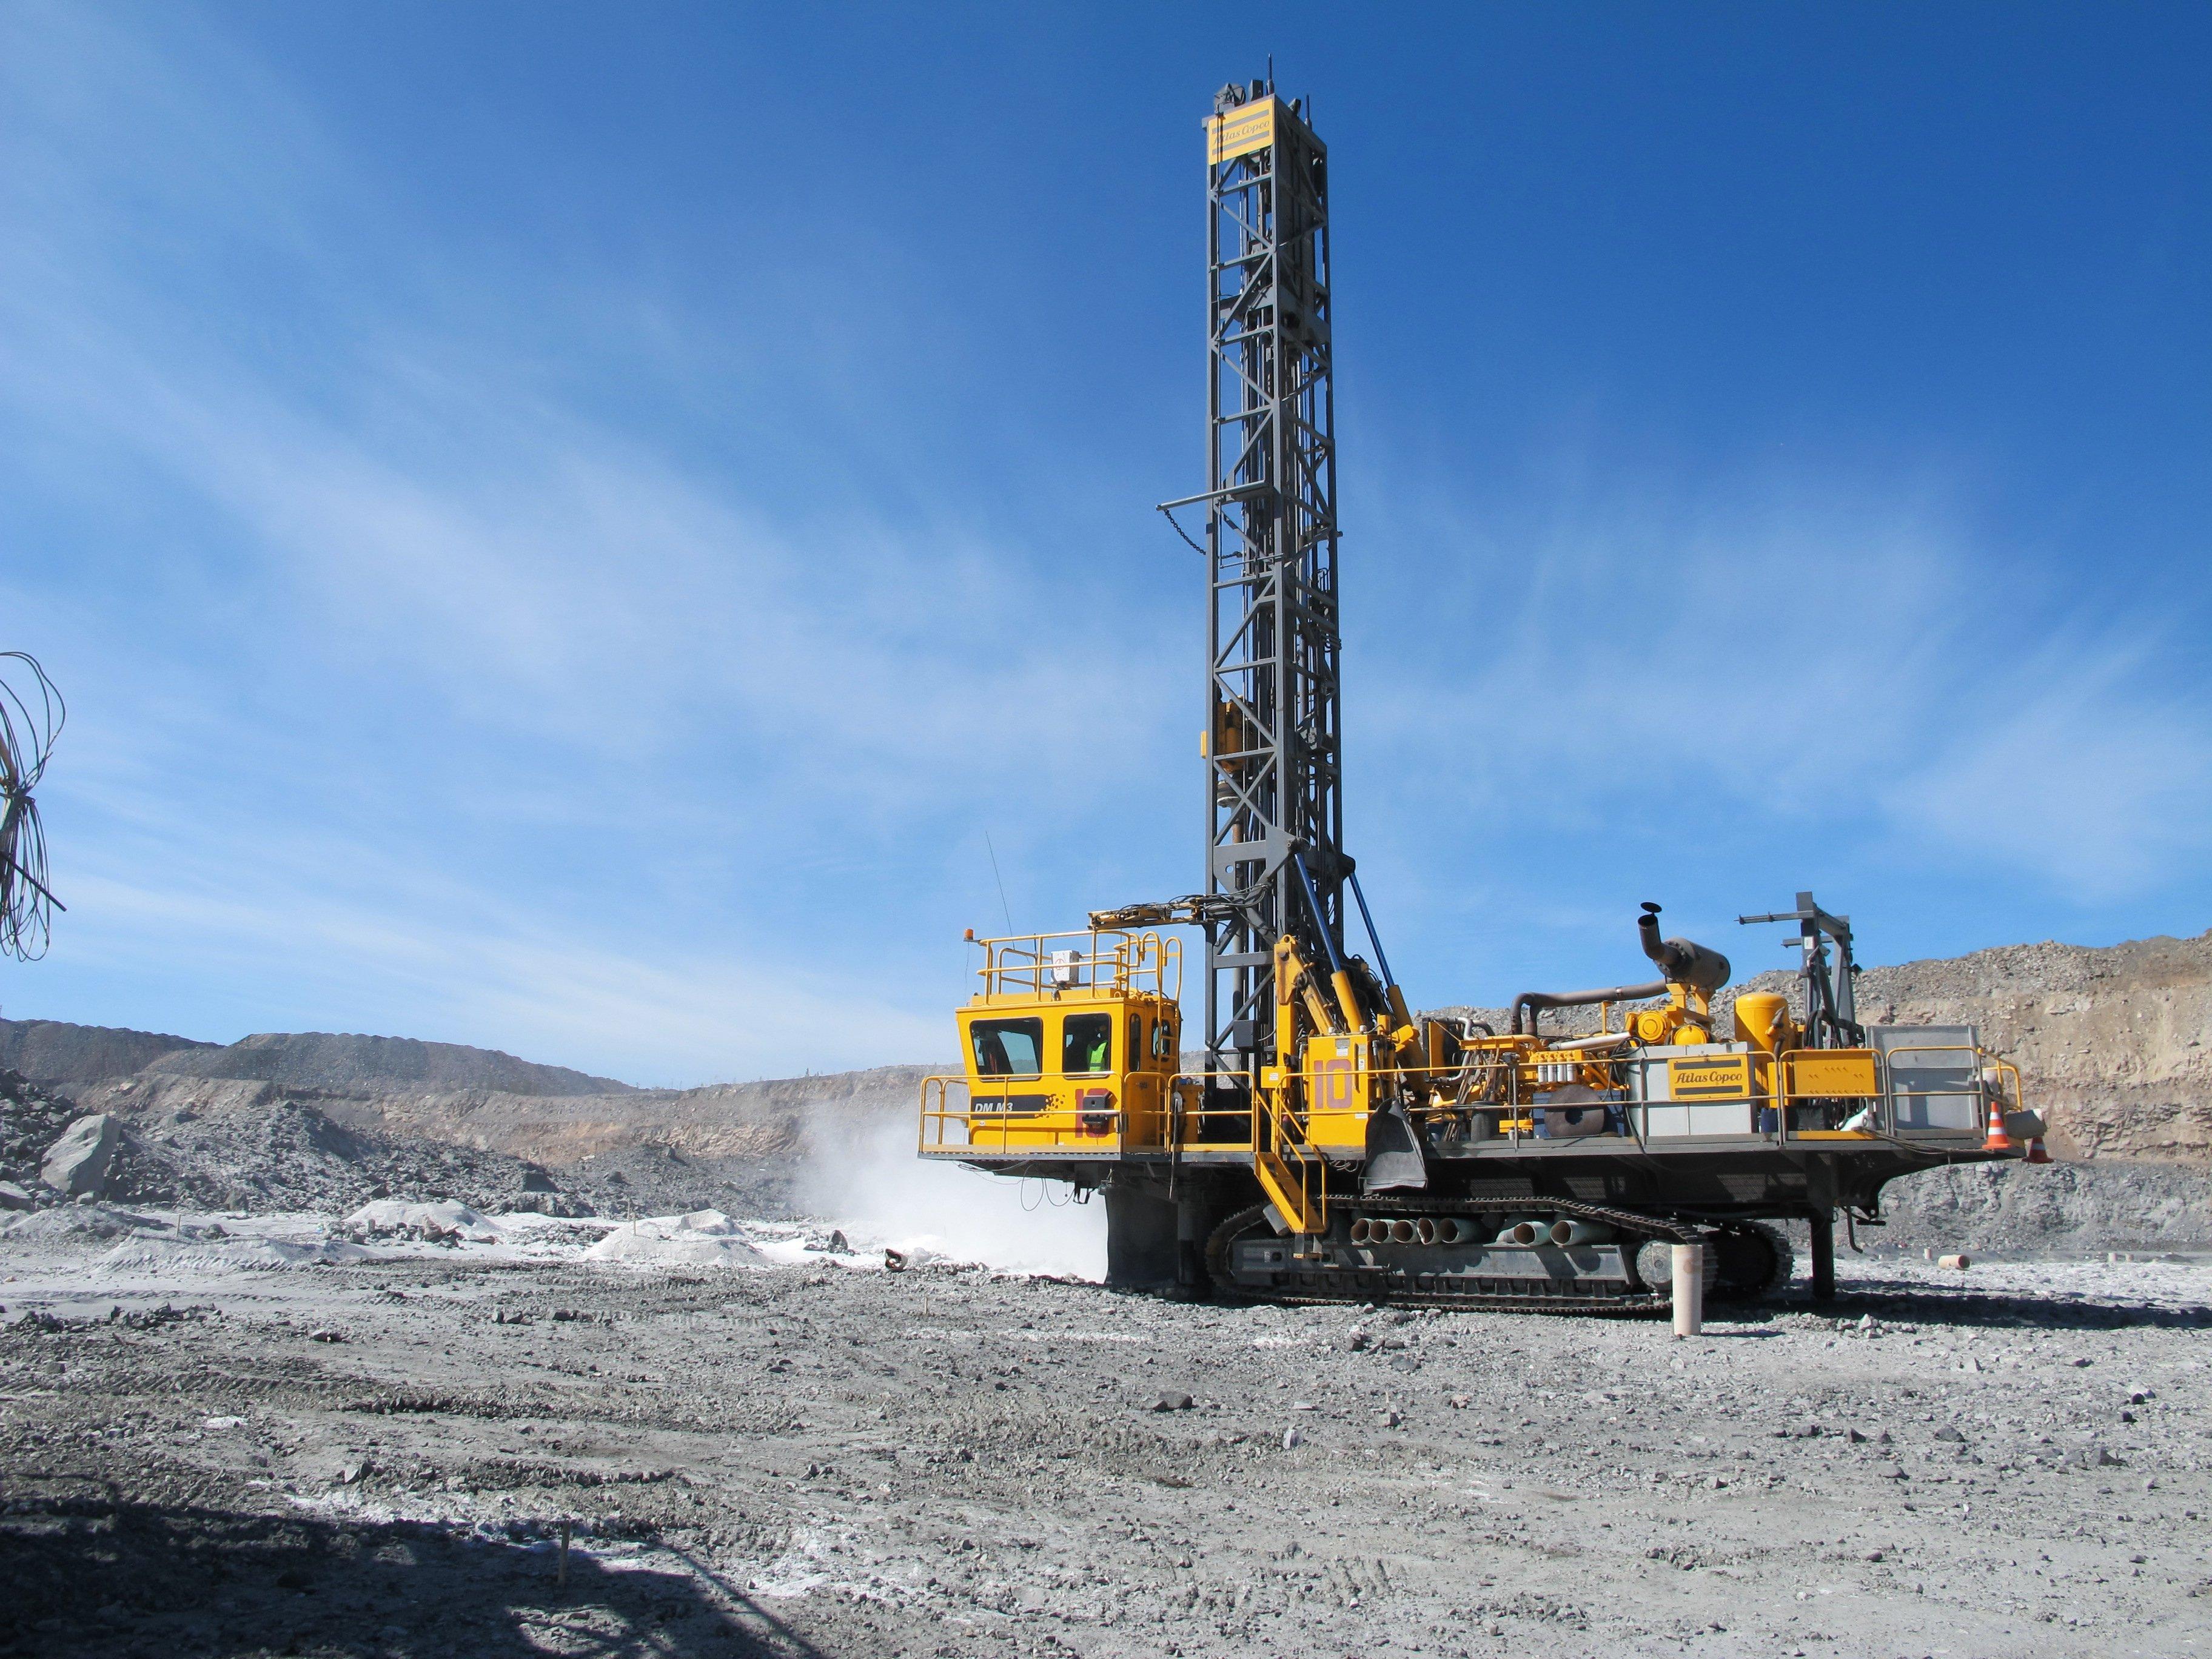 Drilling rig - Wikipedia